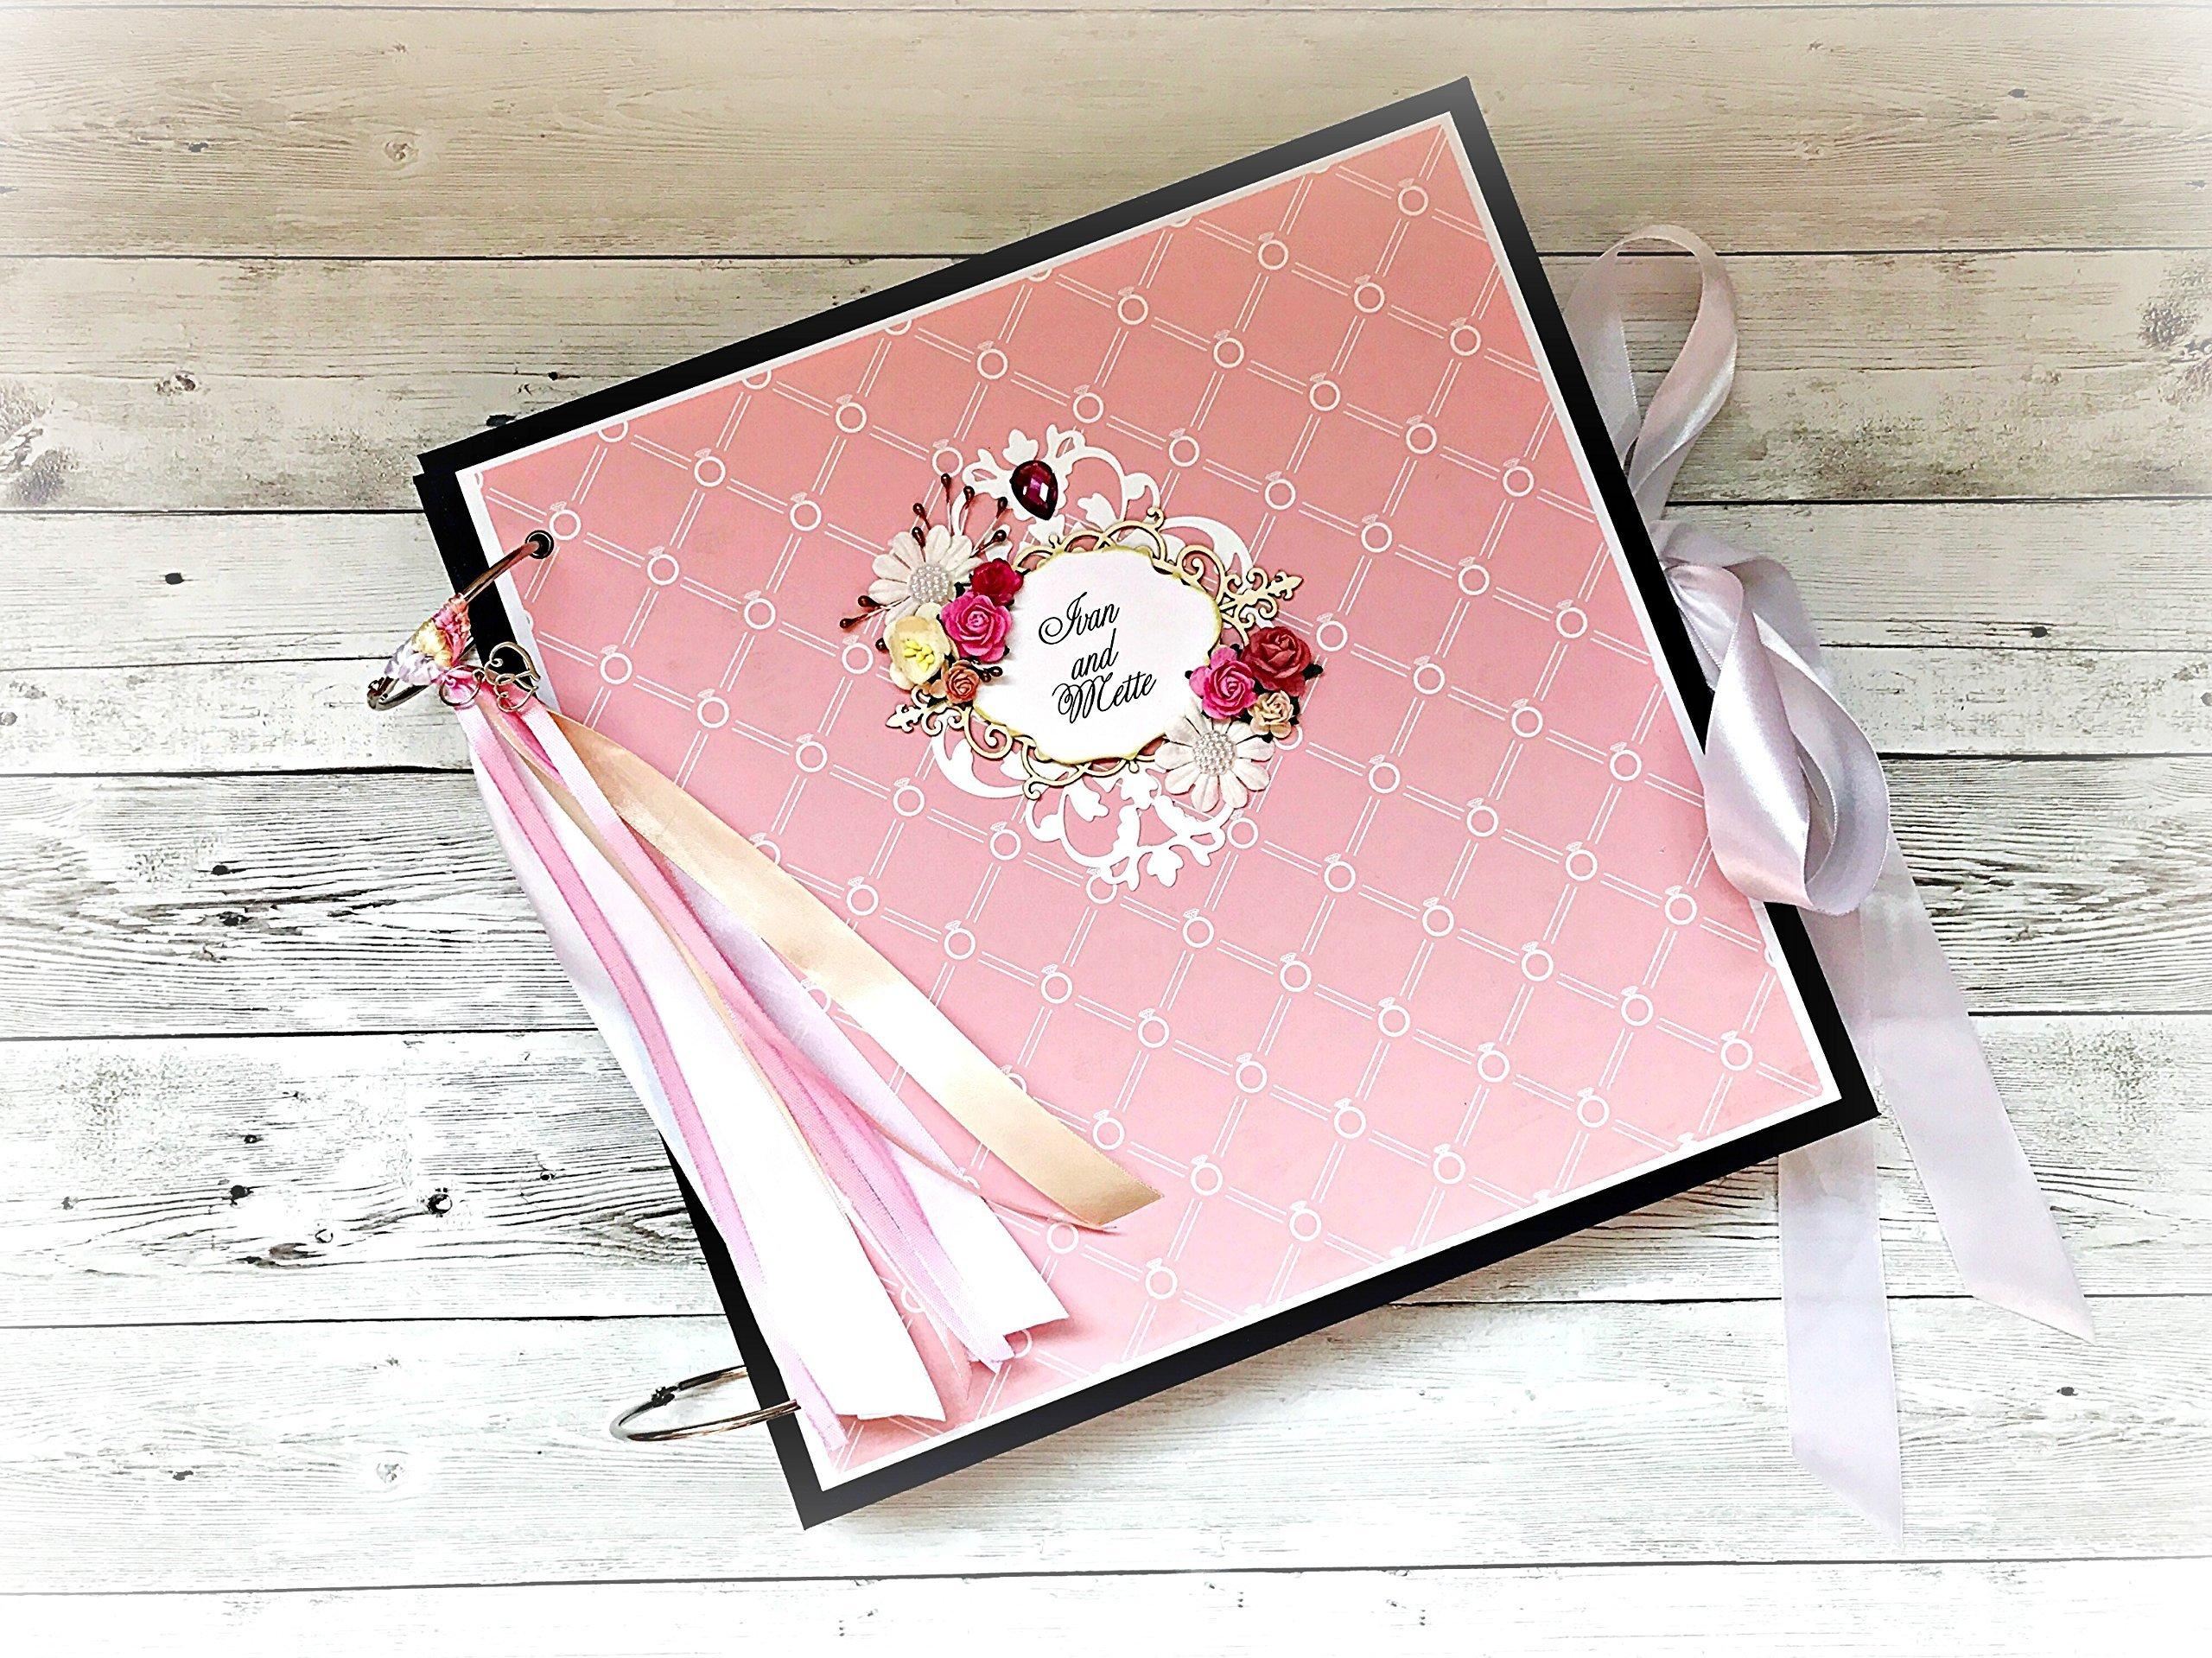 Kristabella Creations 12x12 2 wedding scrapbook album, Large photo album, Wedding gift, 20 inner pages, metal rings binder